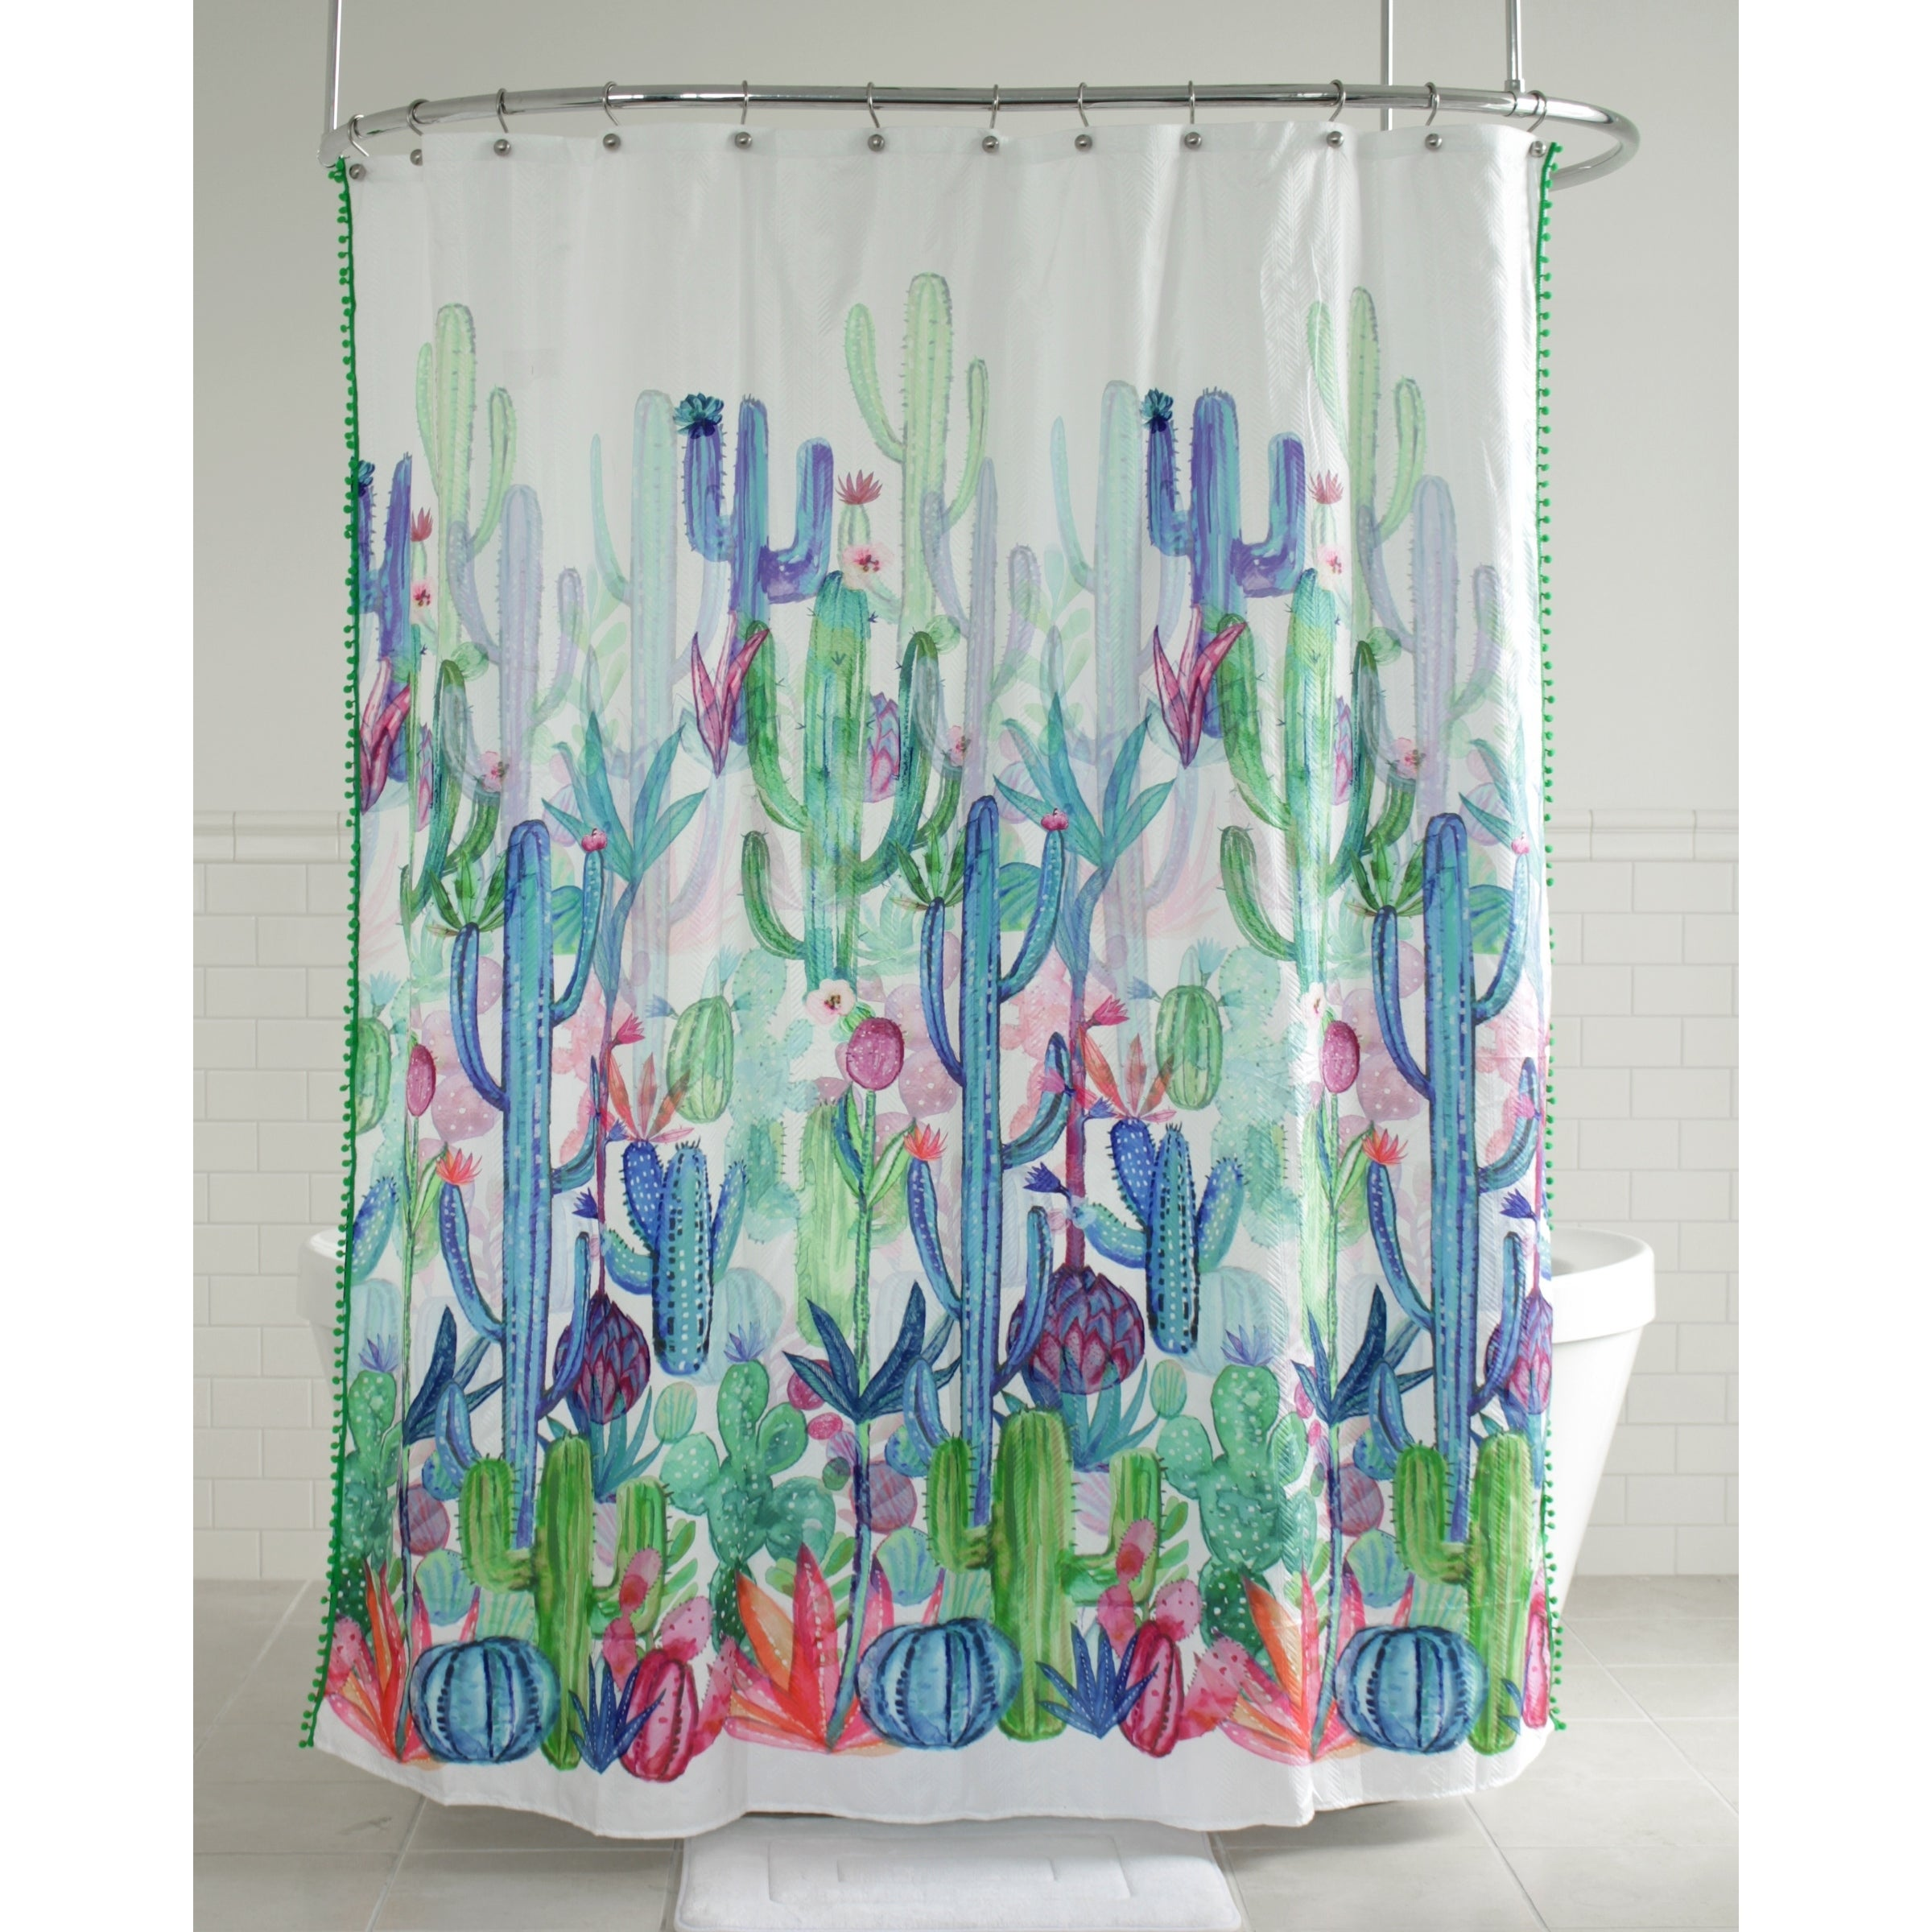 Splash Home Gobi Cactus Polyester Fabric Shower Curtain